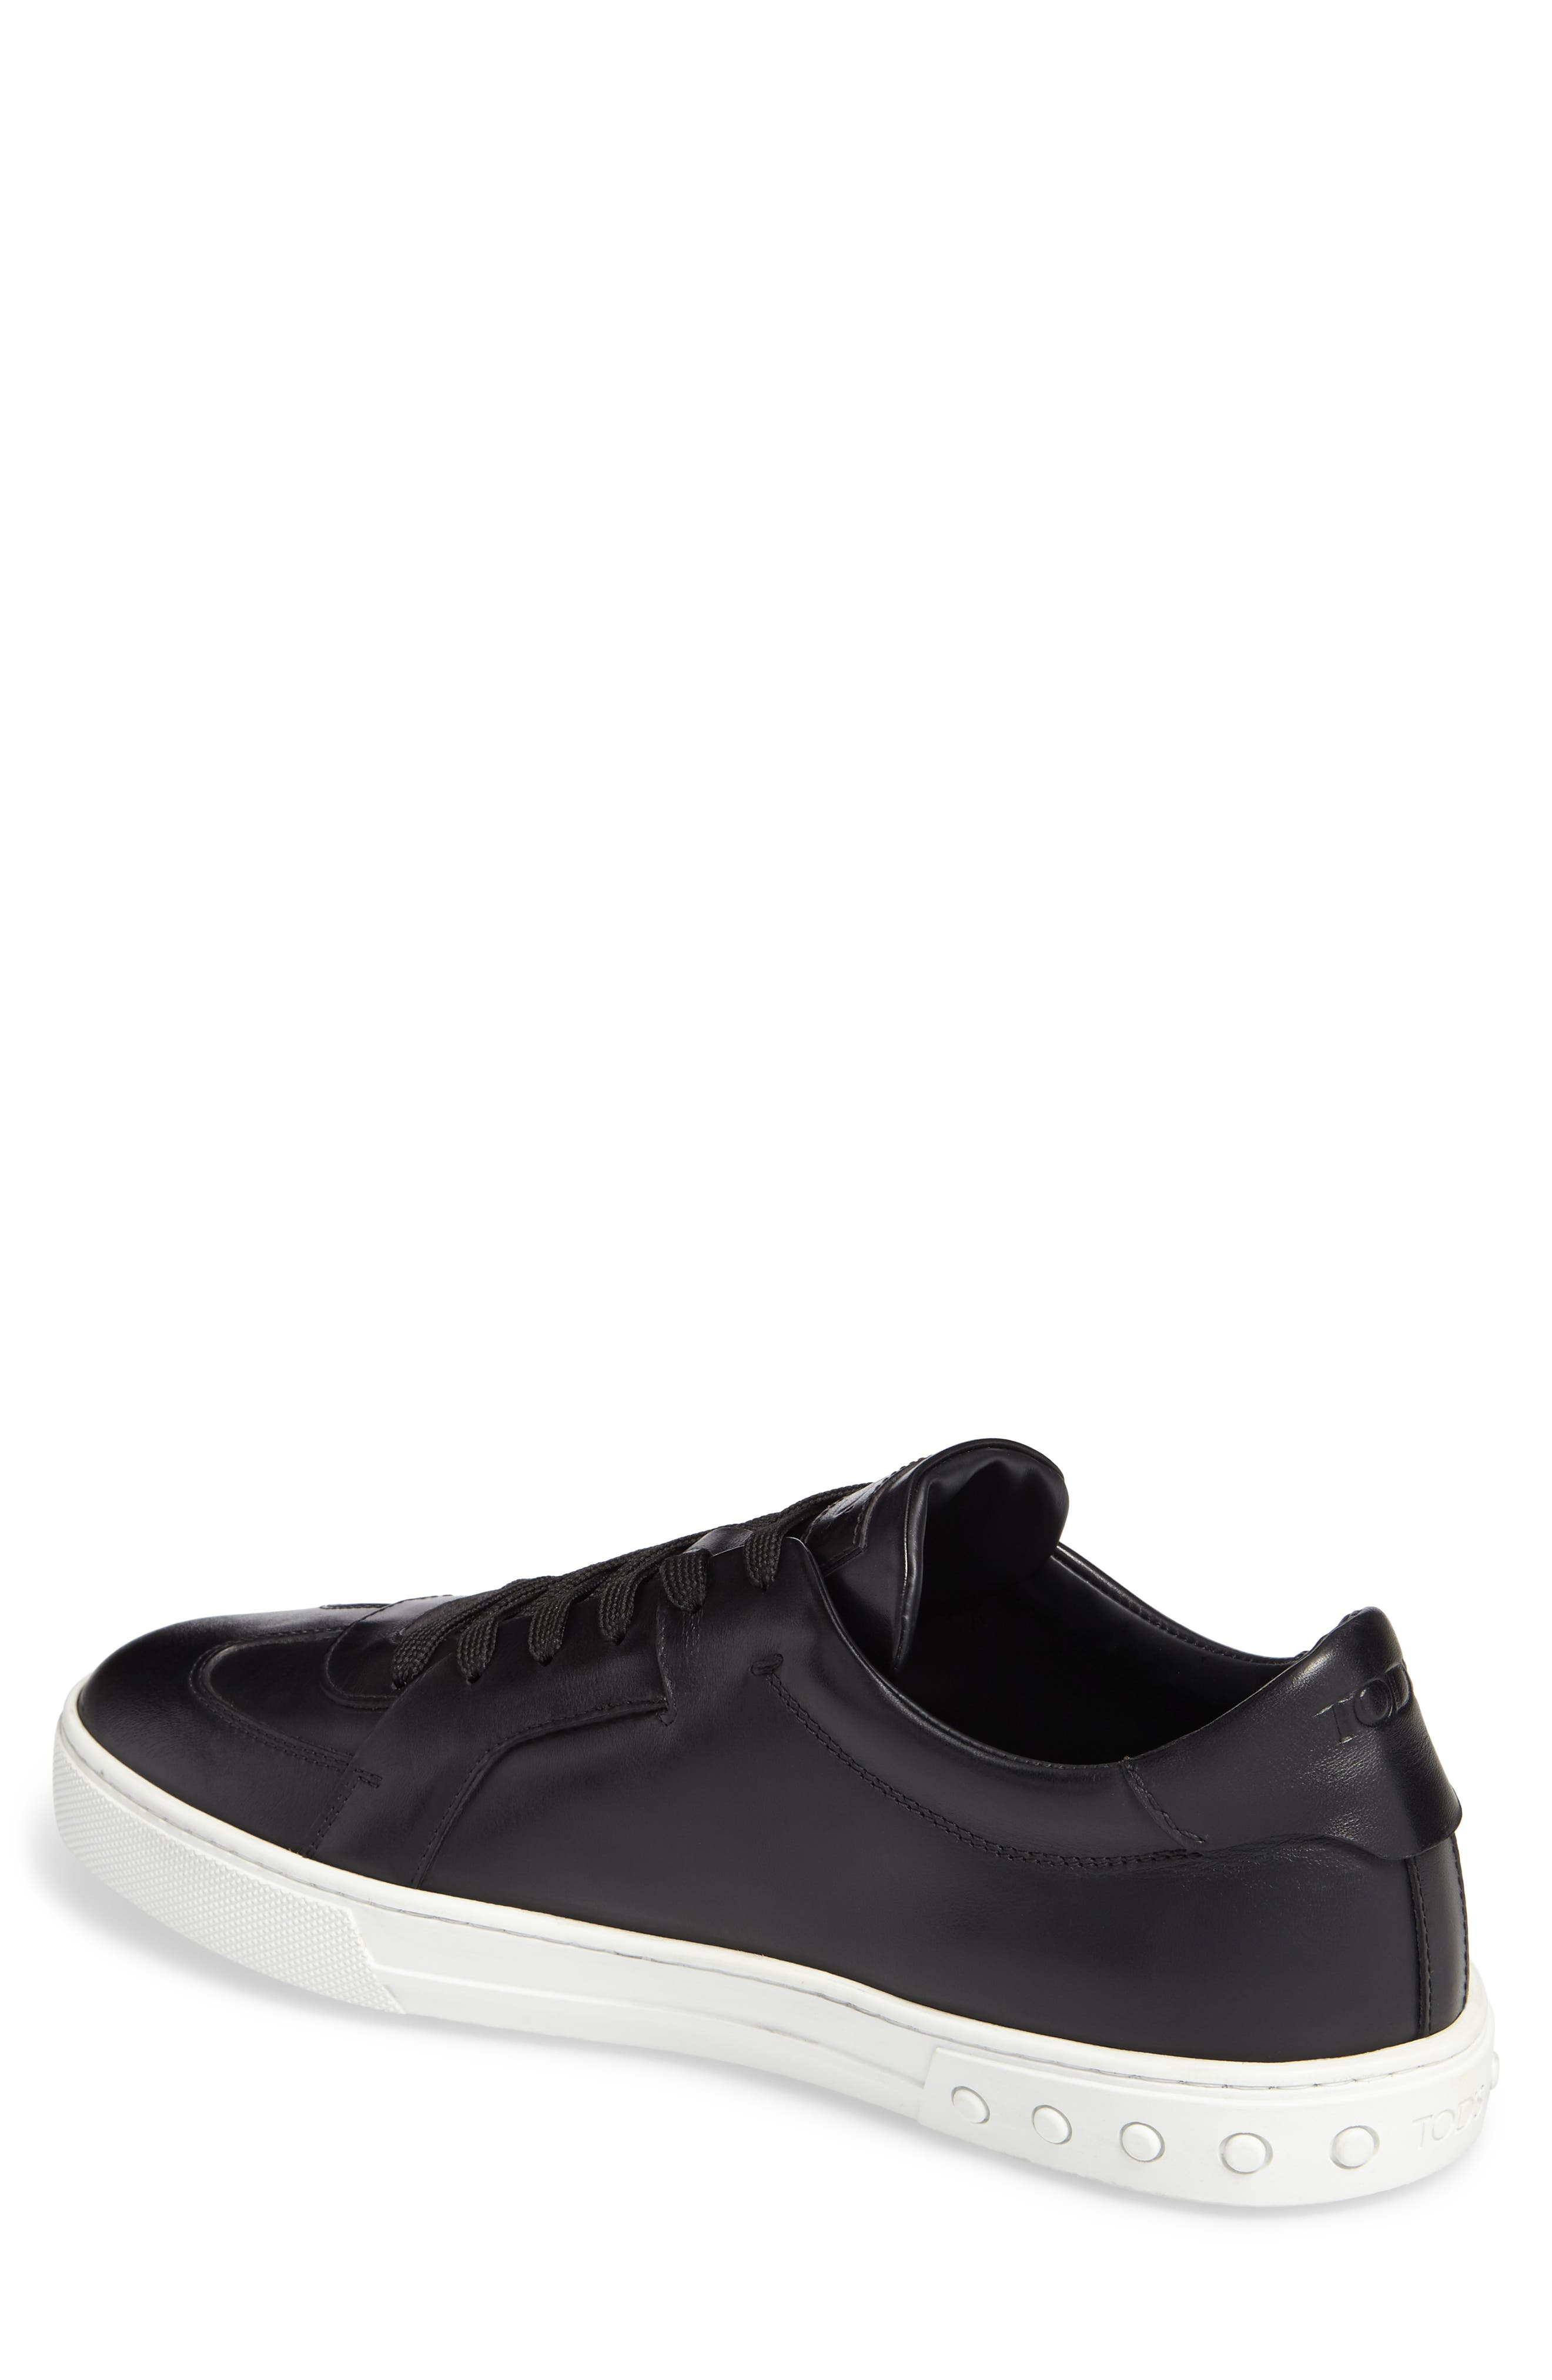 Cassetta Leather Sneaker,                             Alternate thumbnail 2, color,                             Black Leather